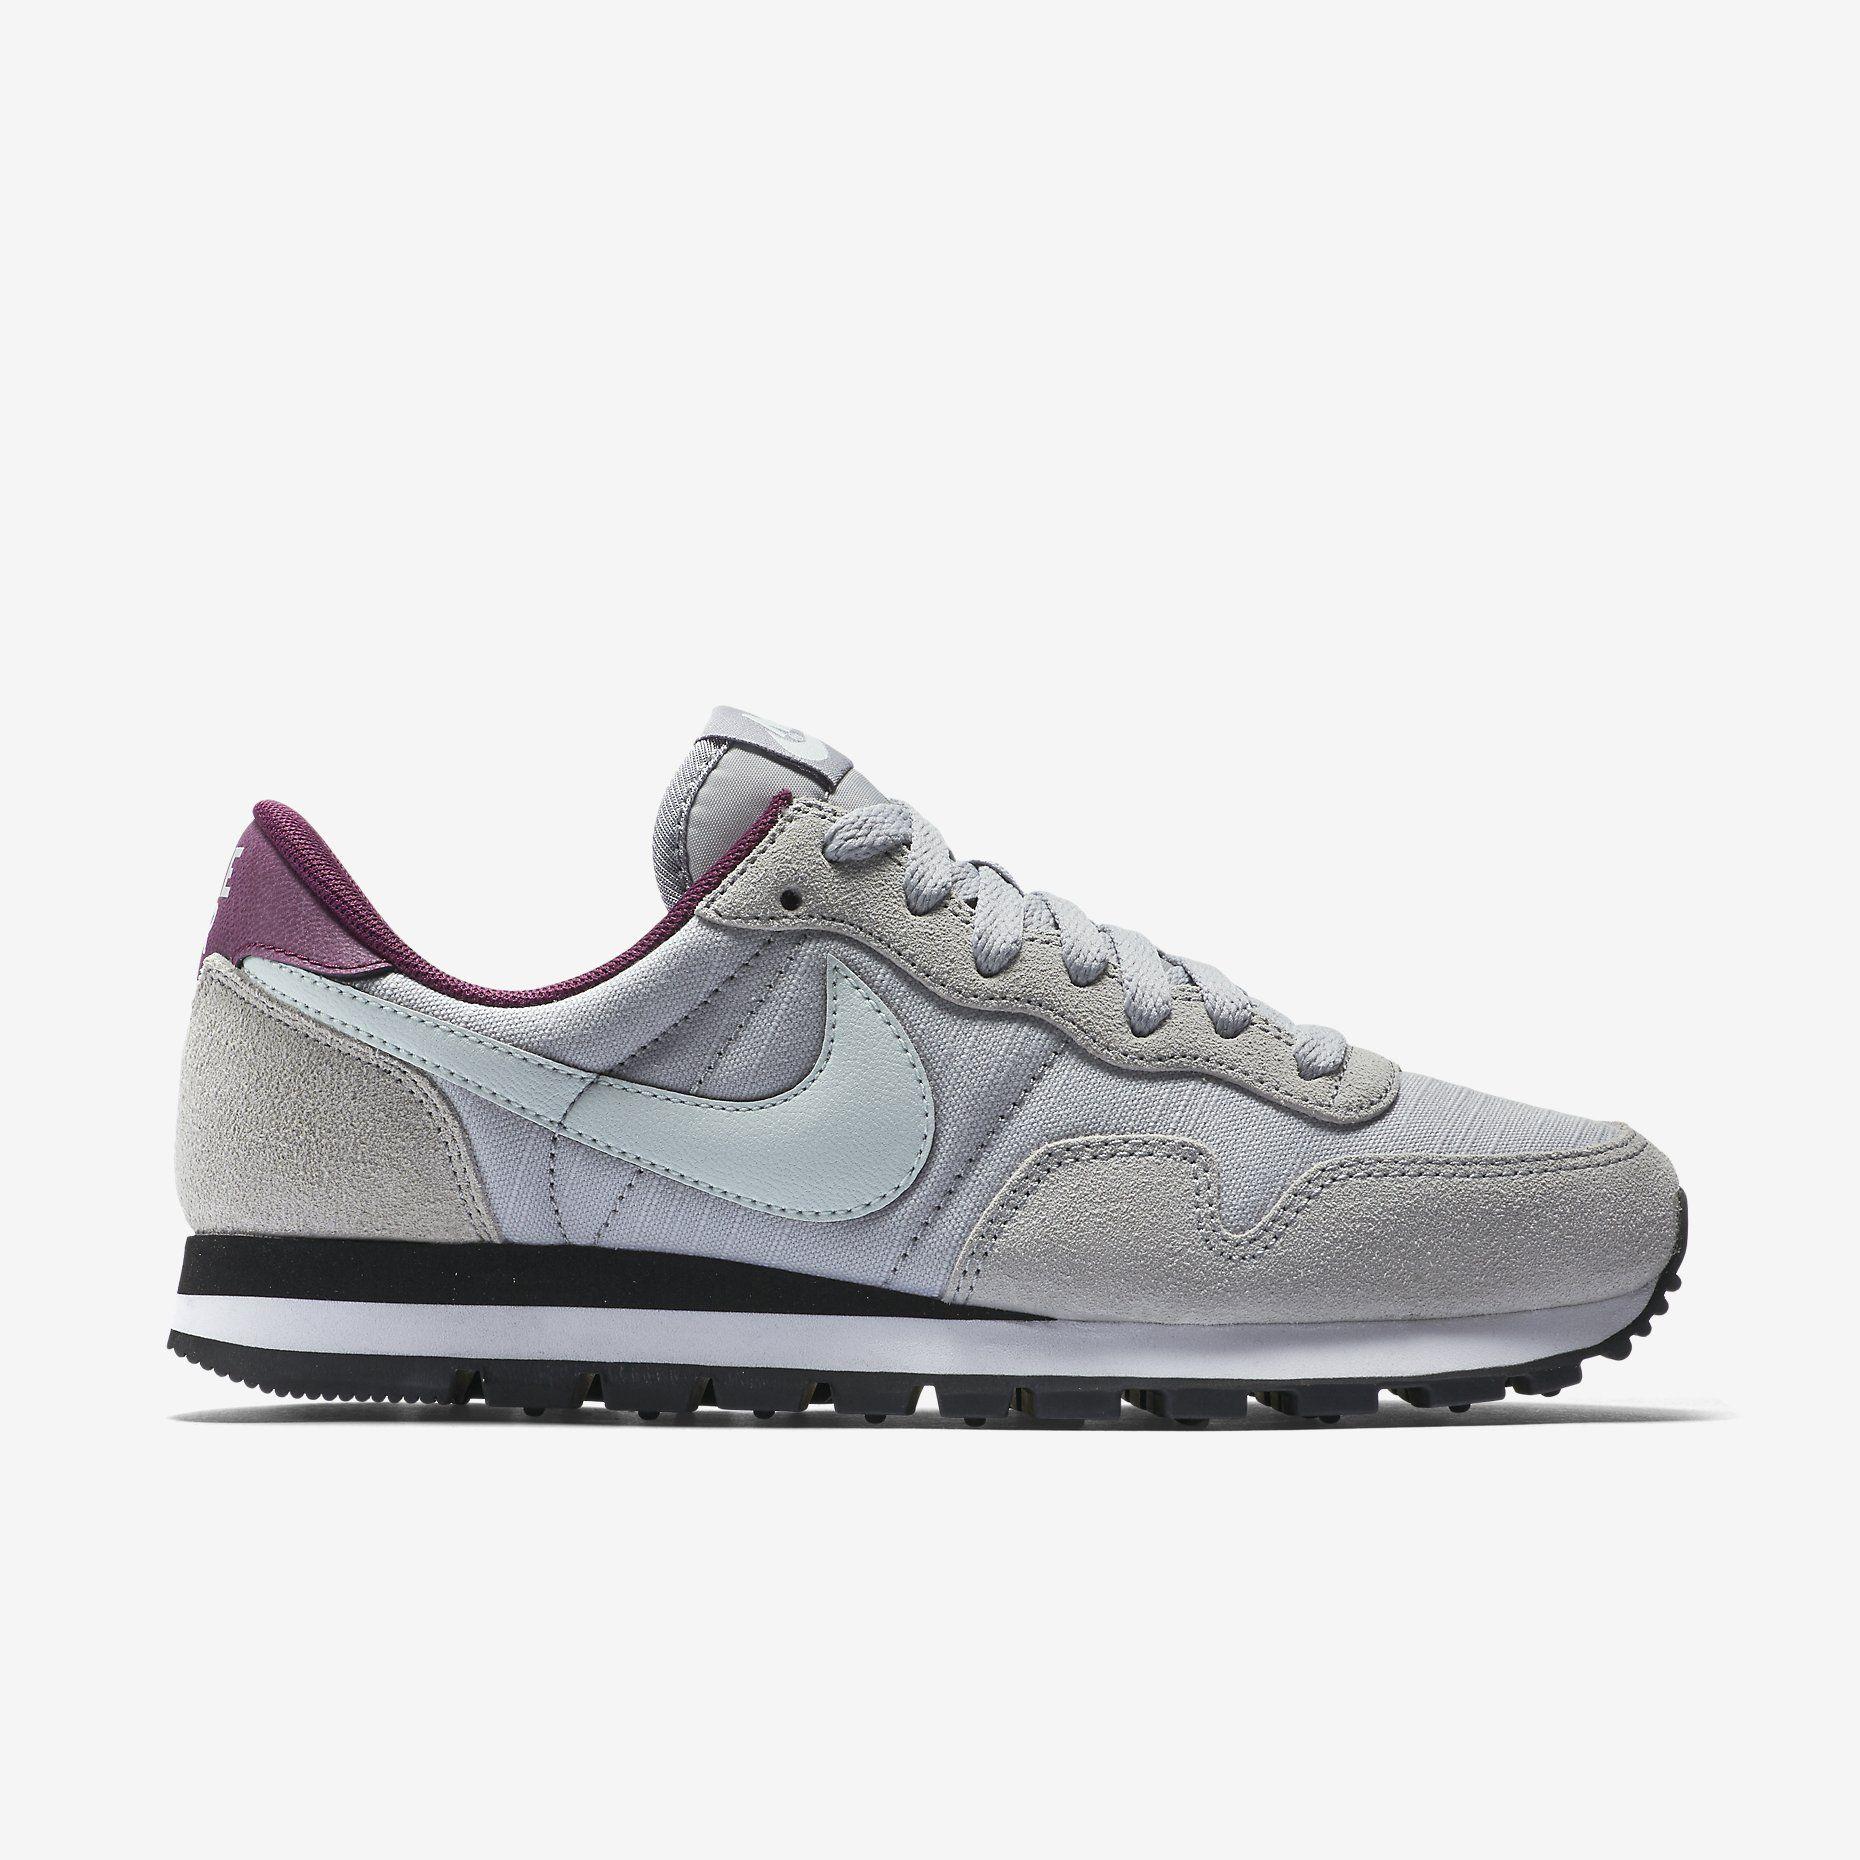 9ce5f660bdb5c Nike Air Pegasus 83 Women s Shoe. Nike Store